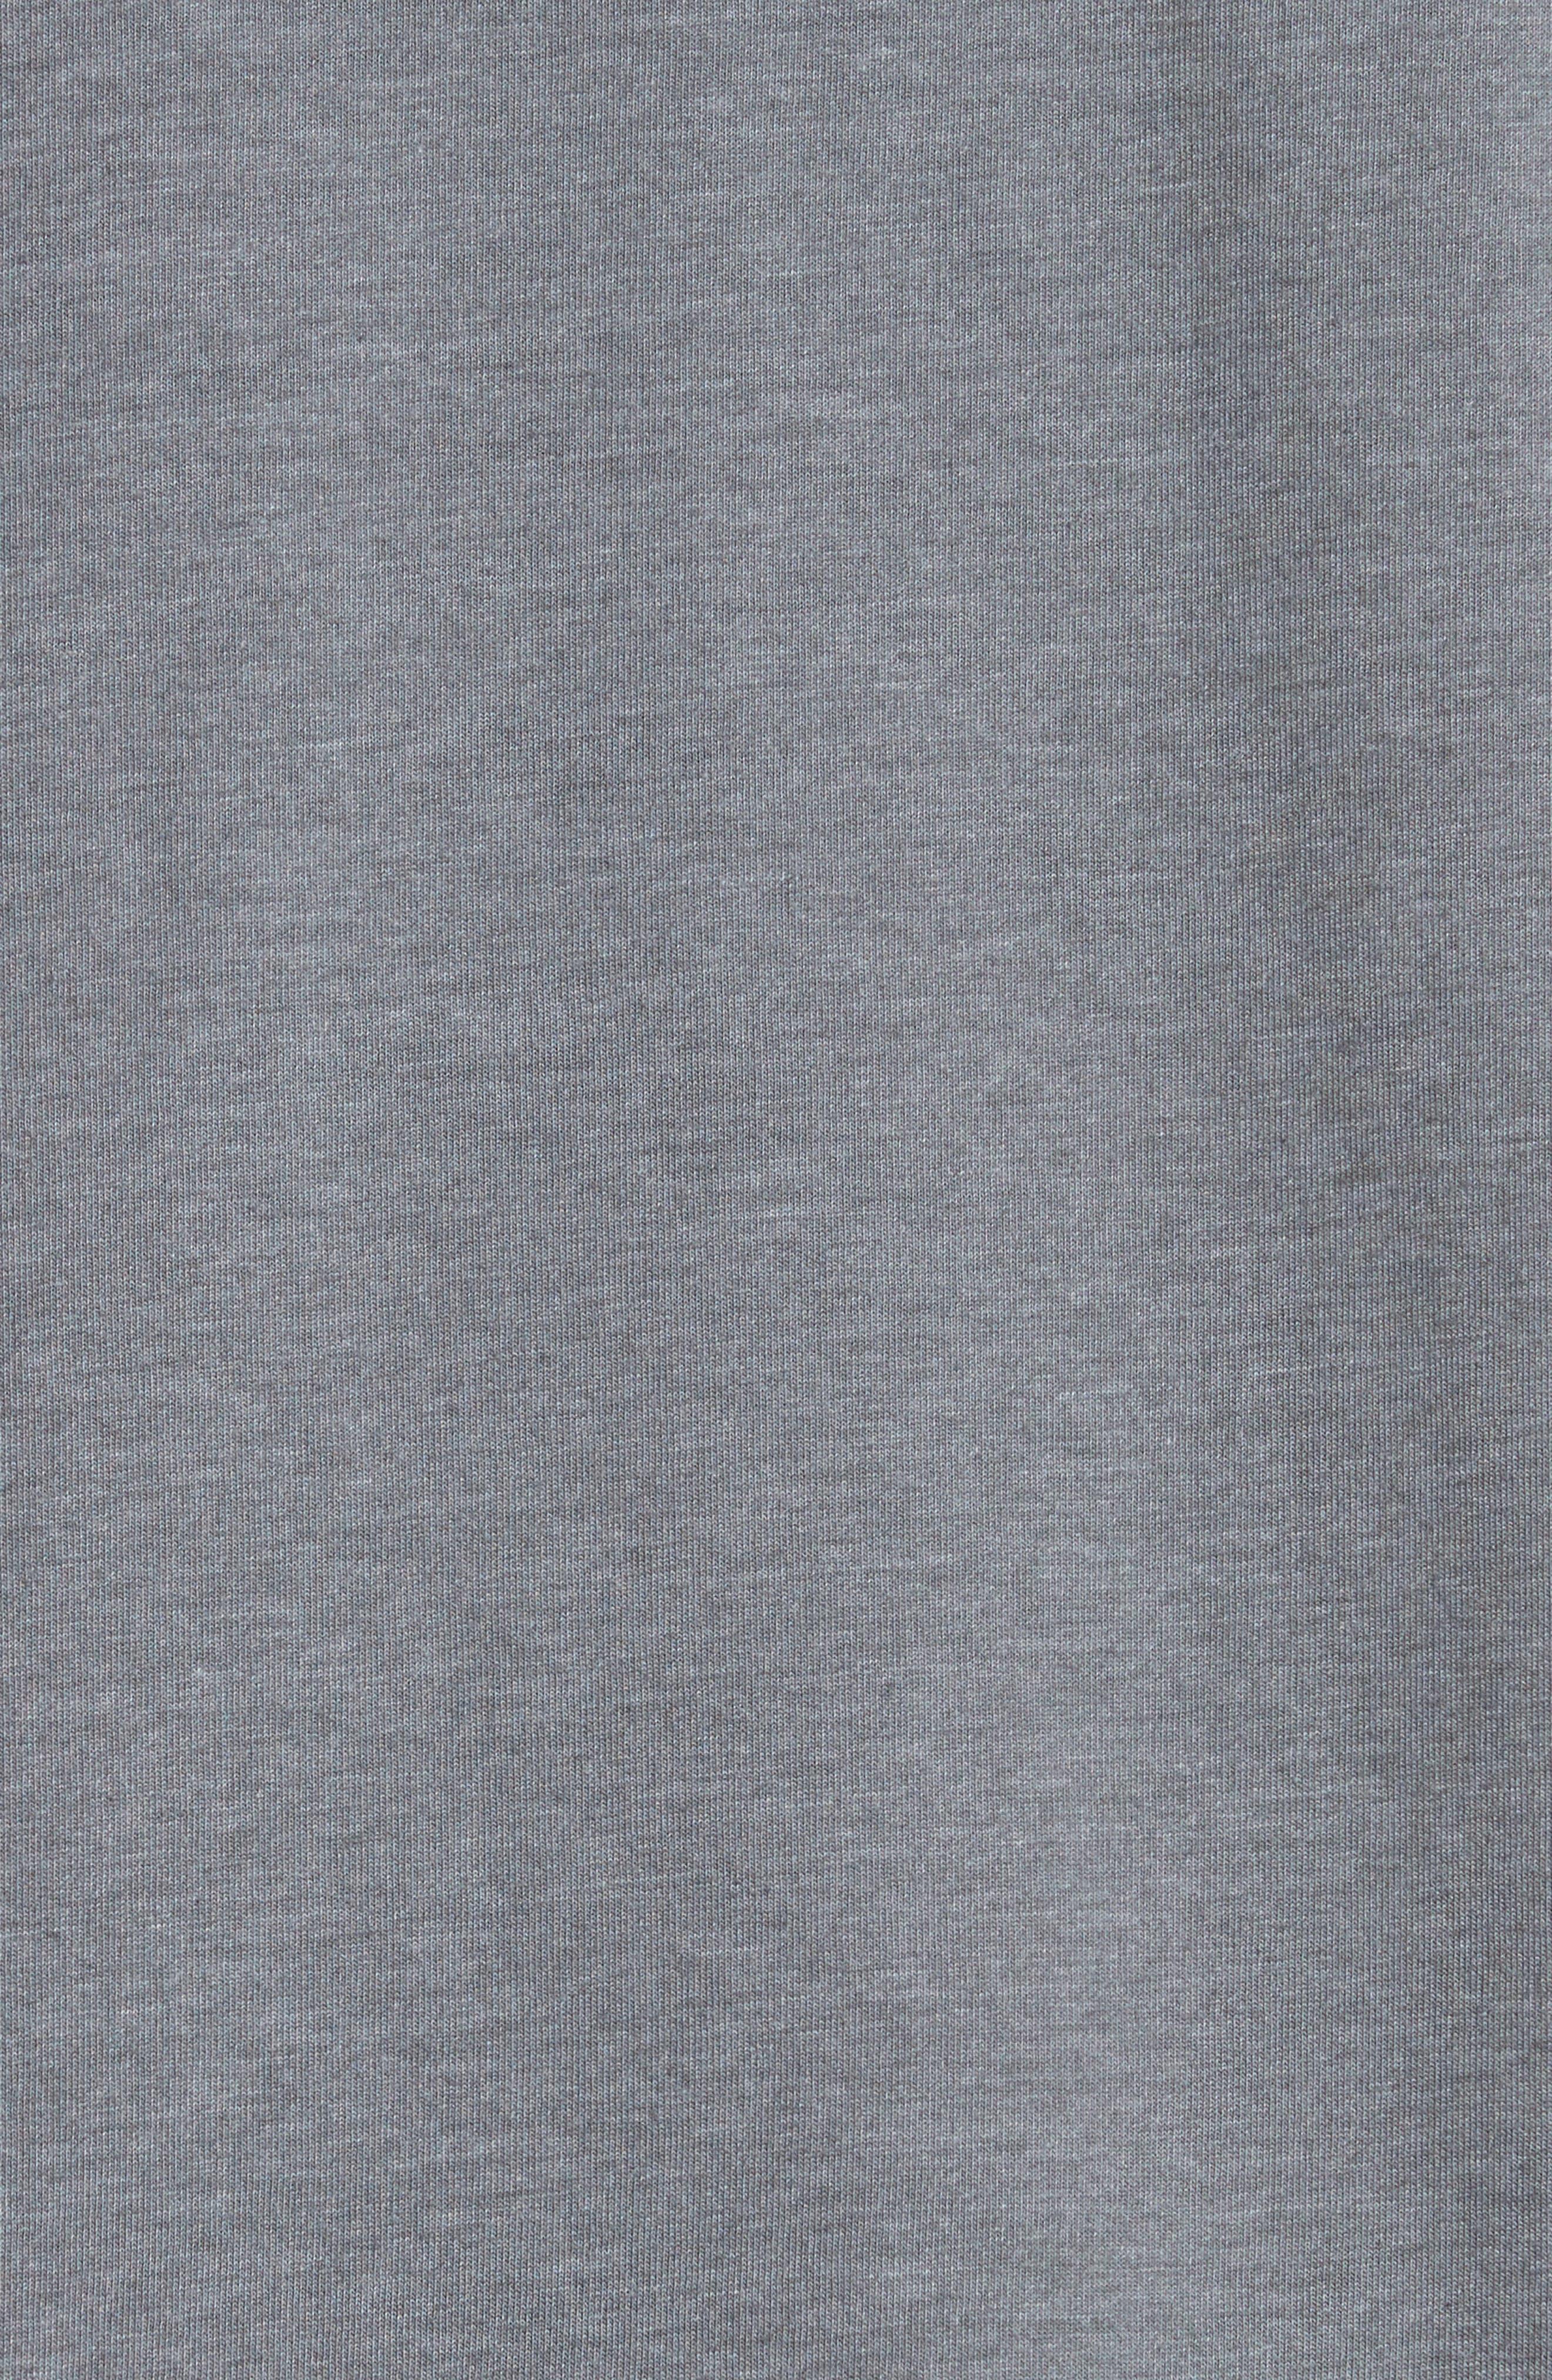 Unisex Pocket T-Shirt,                             Alternate thumbnail 5, color,                             030